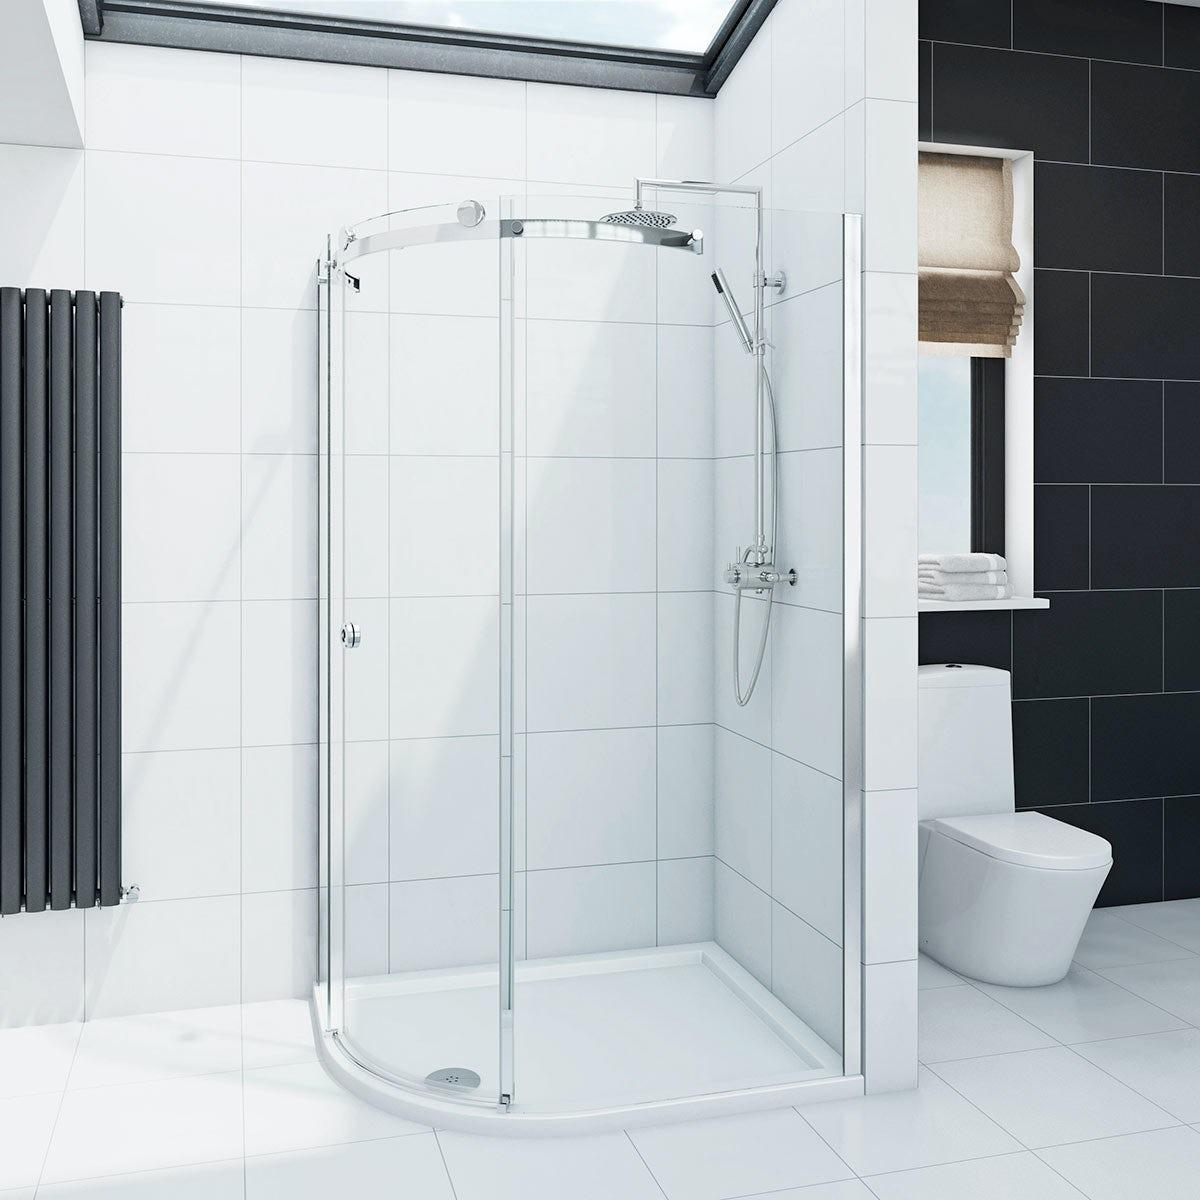 Mode Infiniti 8mm single sliding door left handed offset quadrant shower enclosure 900 x 760